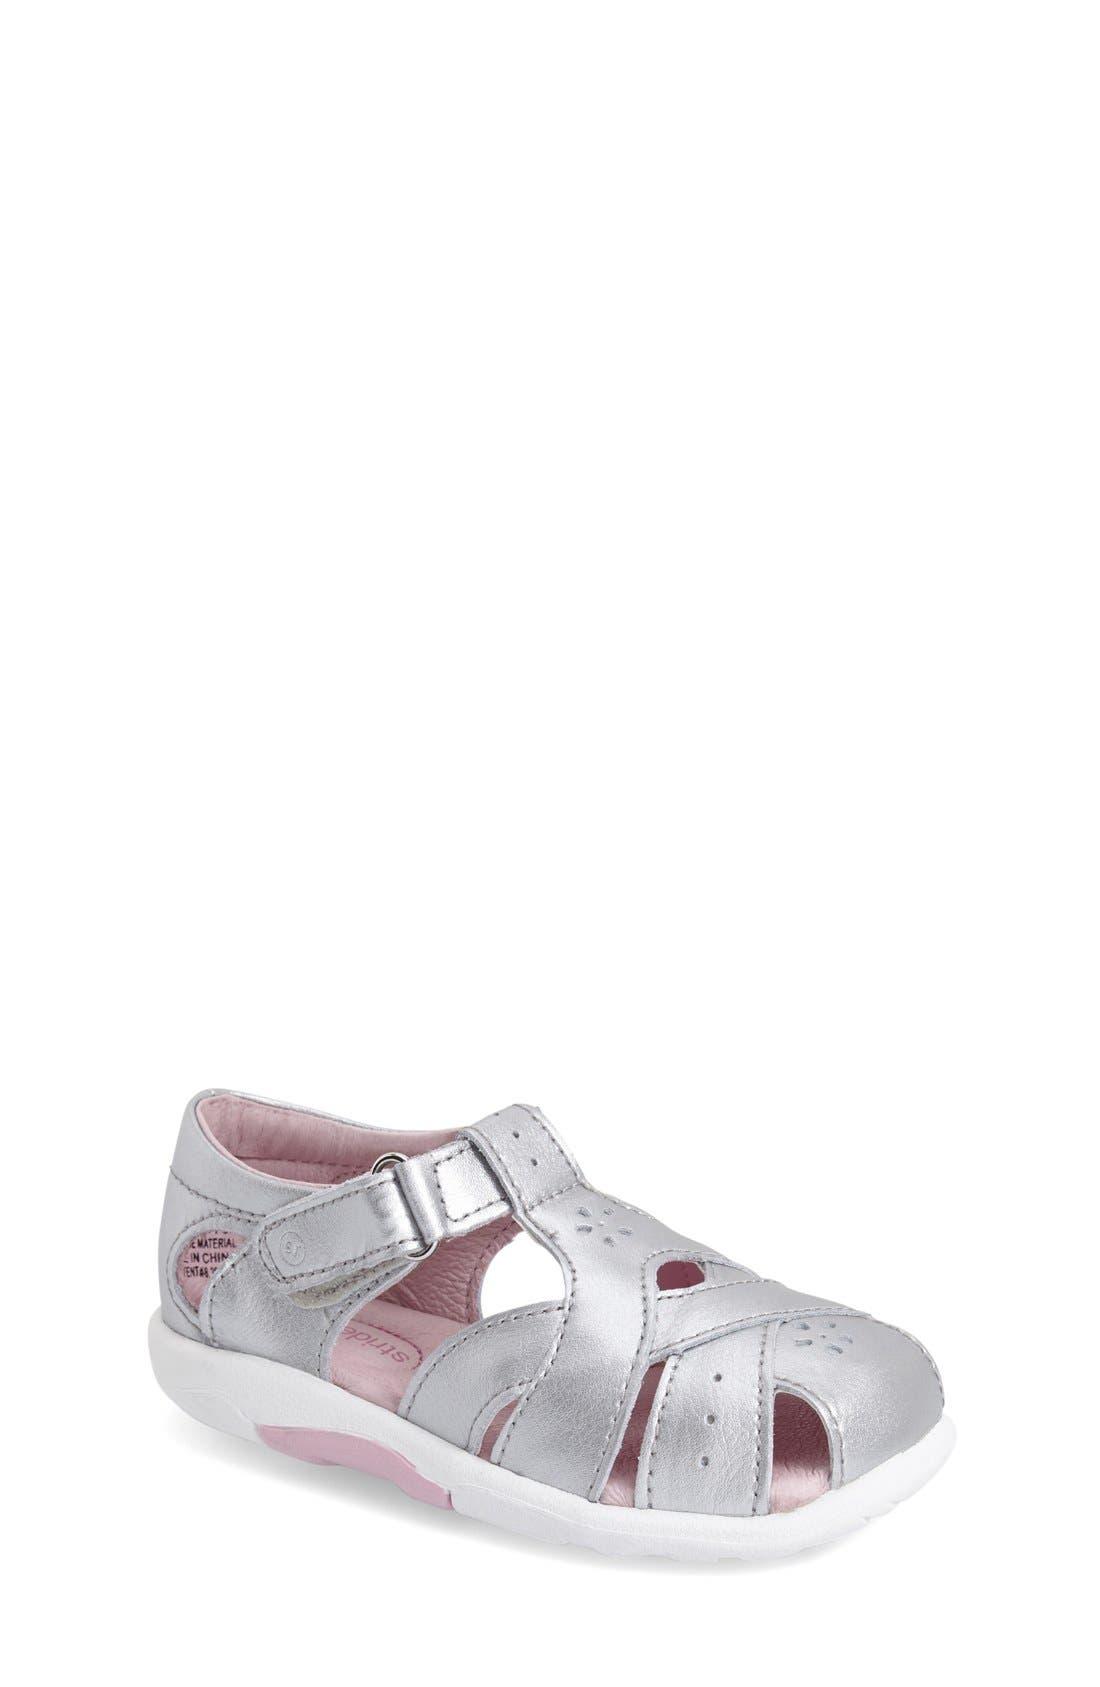 Alternate Image 1 Selected - Stride Rite 'Tulip' Sandal (Baby, Walker & Toddler)